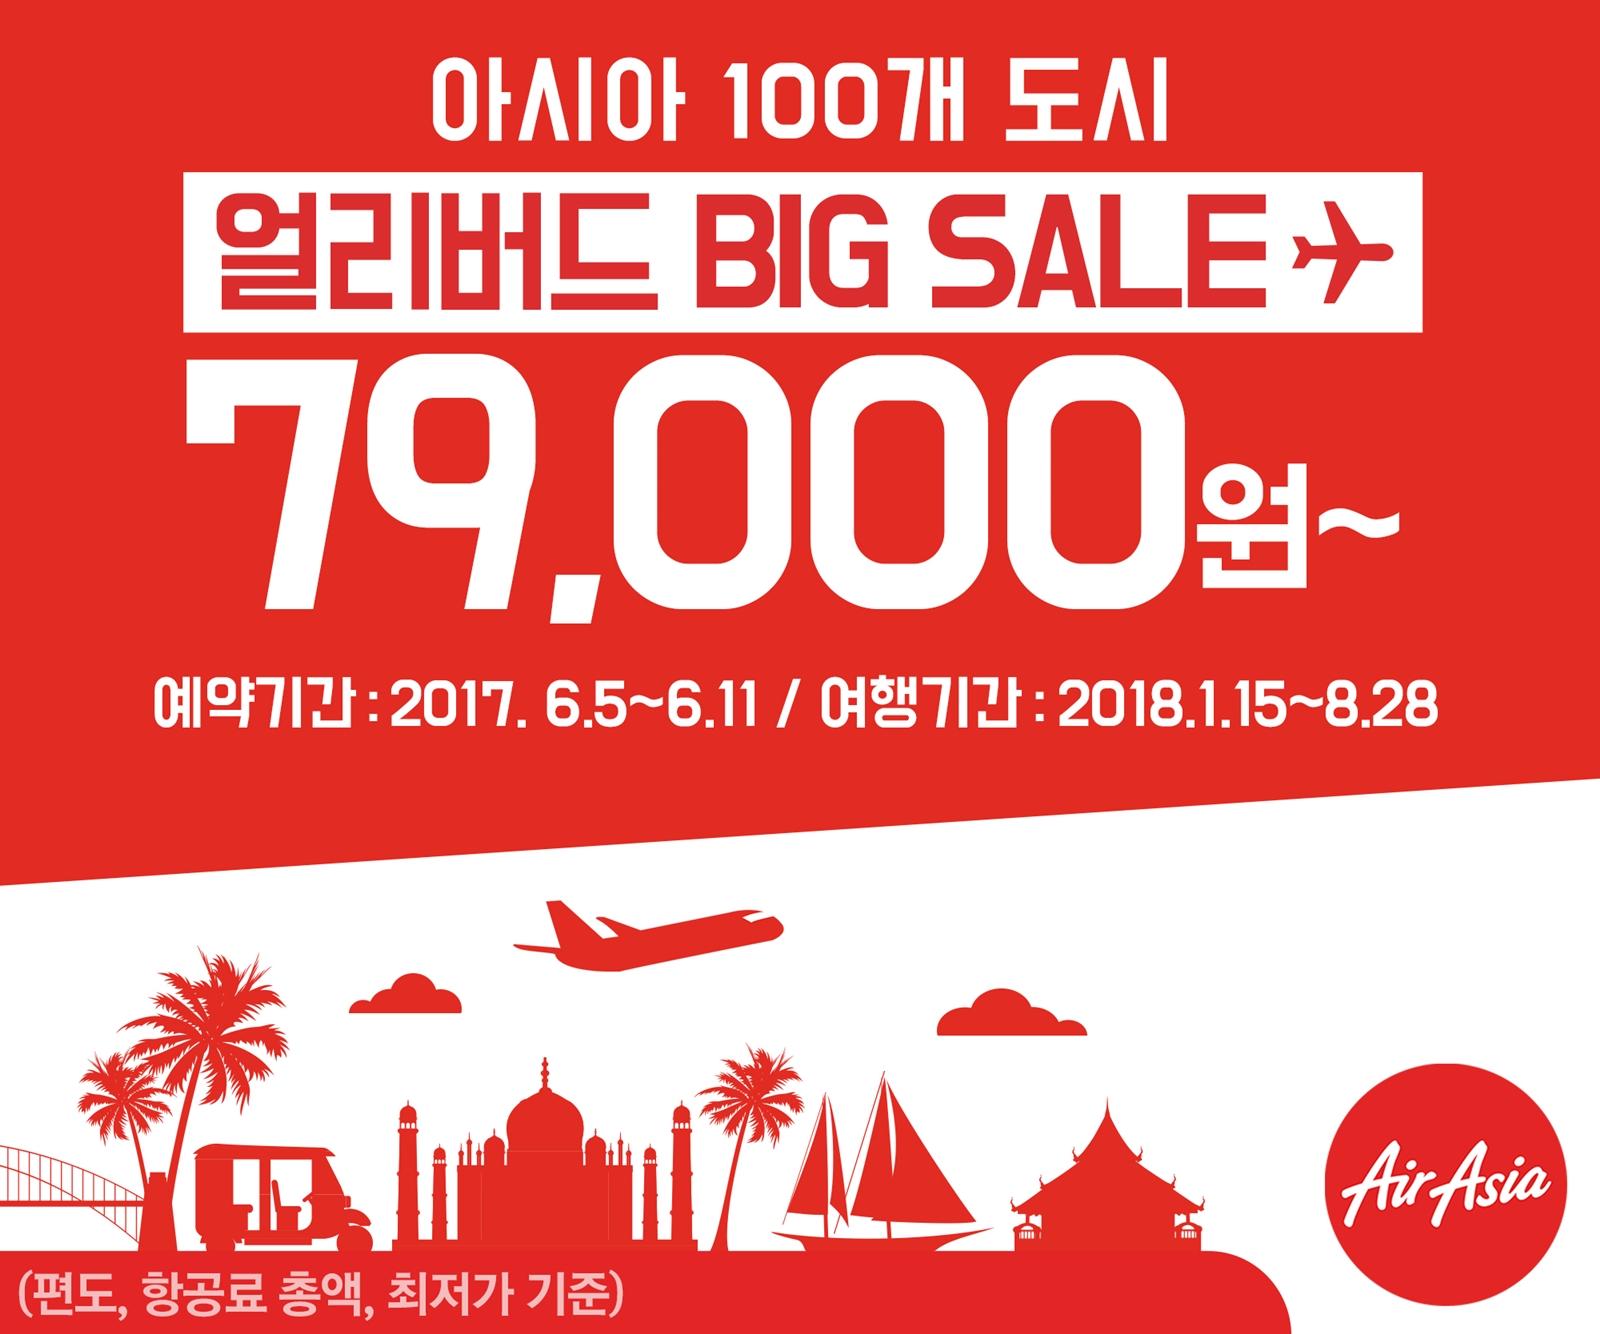 AirAsia has 'Early Bird' BIG SALE.jpg